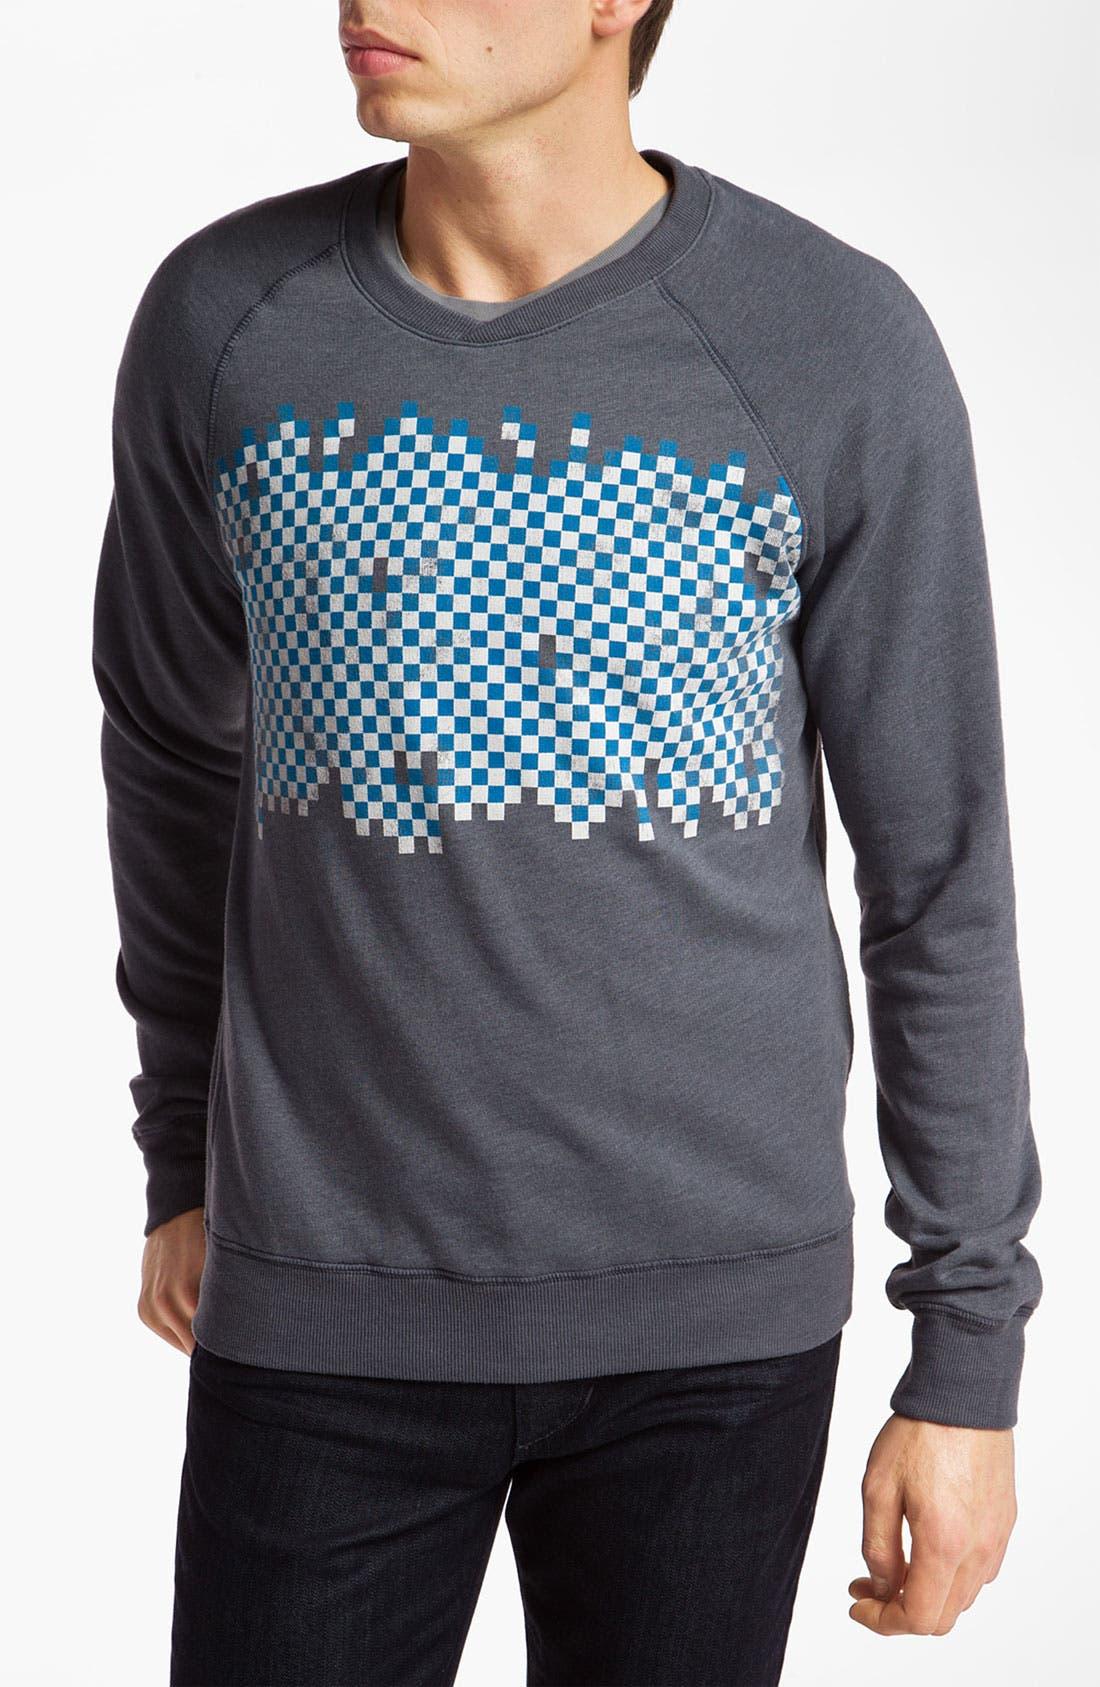 Main Image - Topo Ranch 'Check' Crewneck Sweatshirt